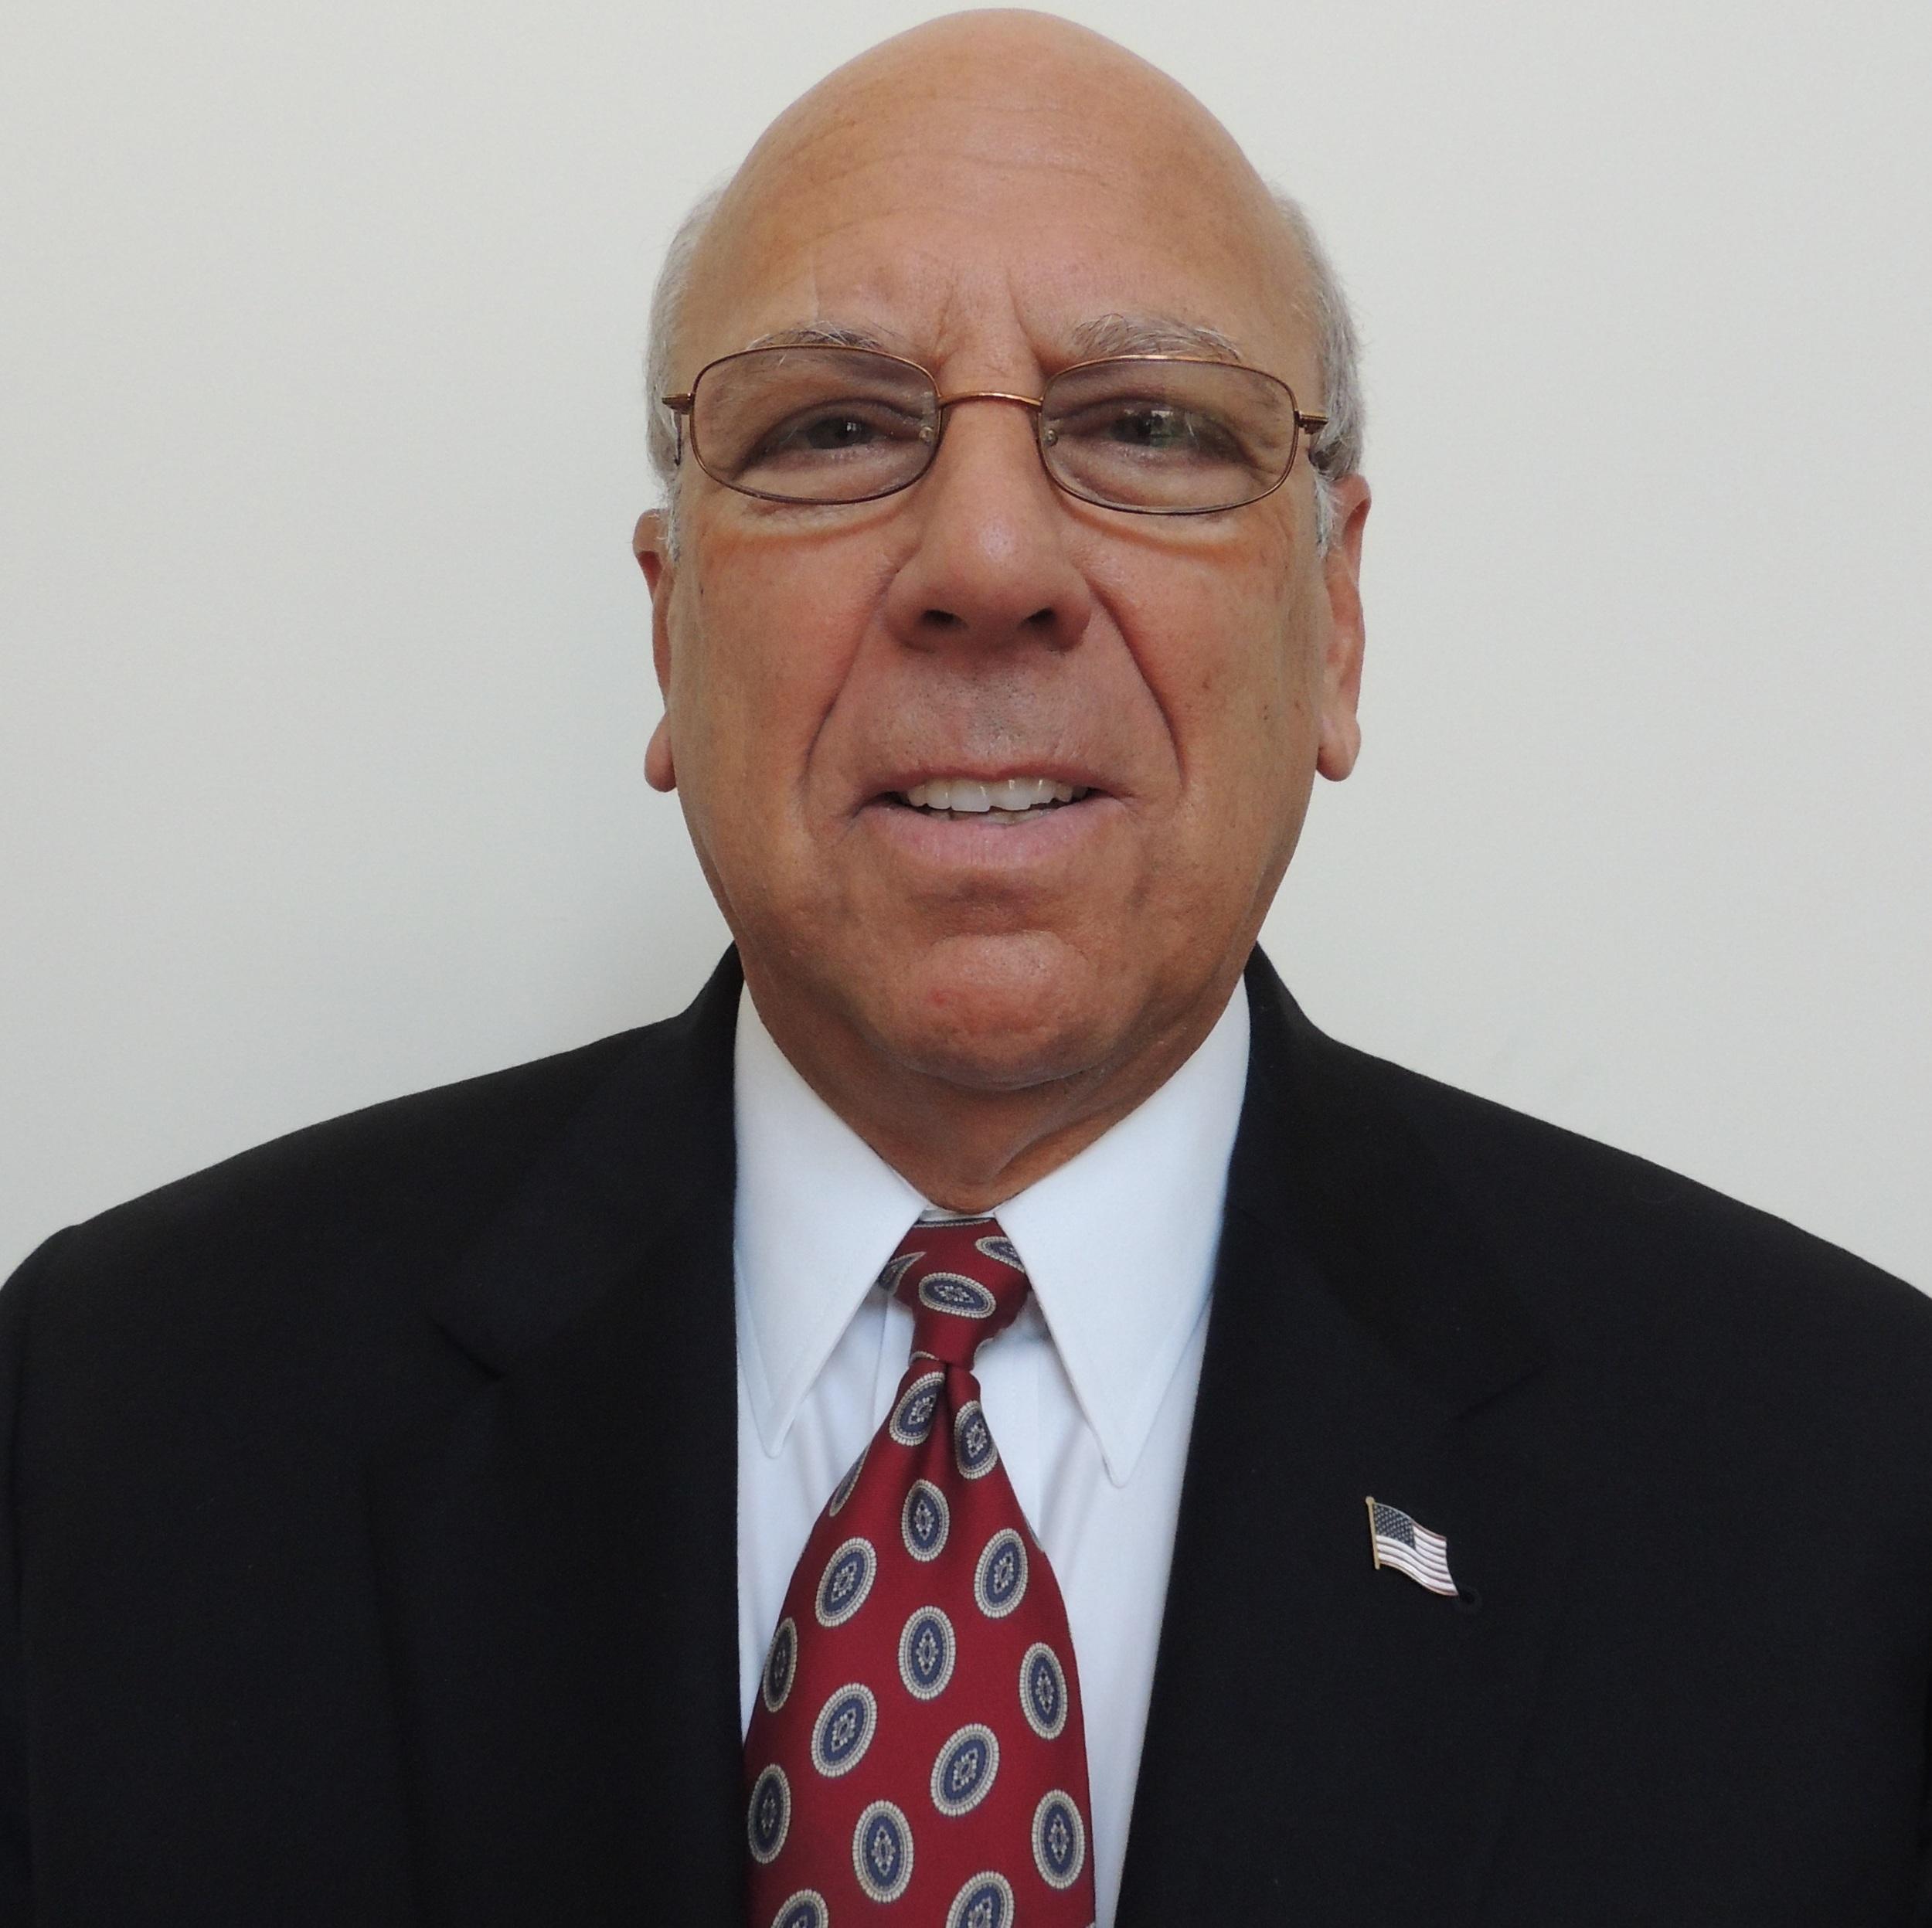 Tom LoPresti  US Army, COL, Retired